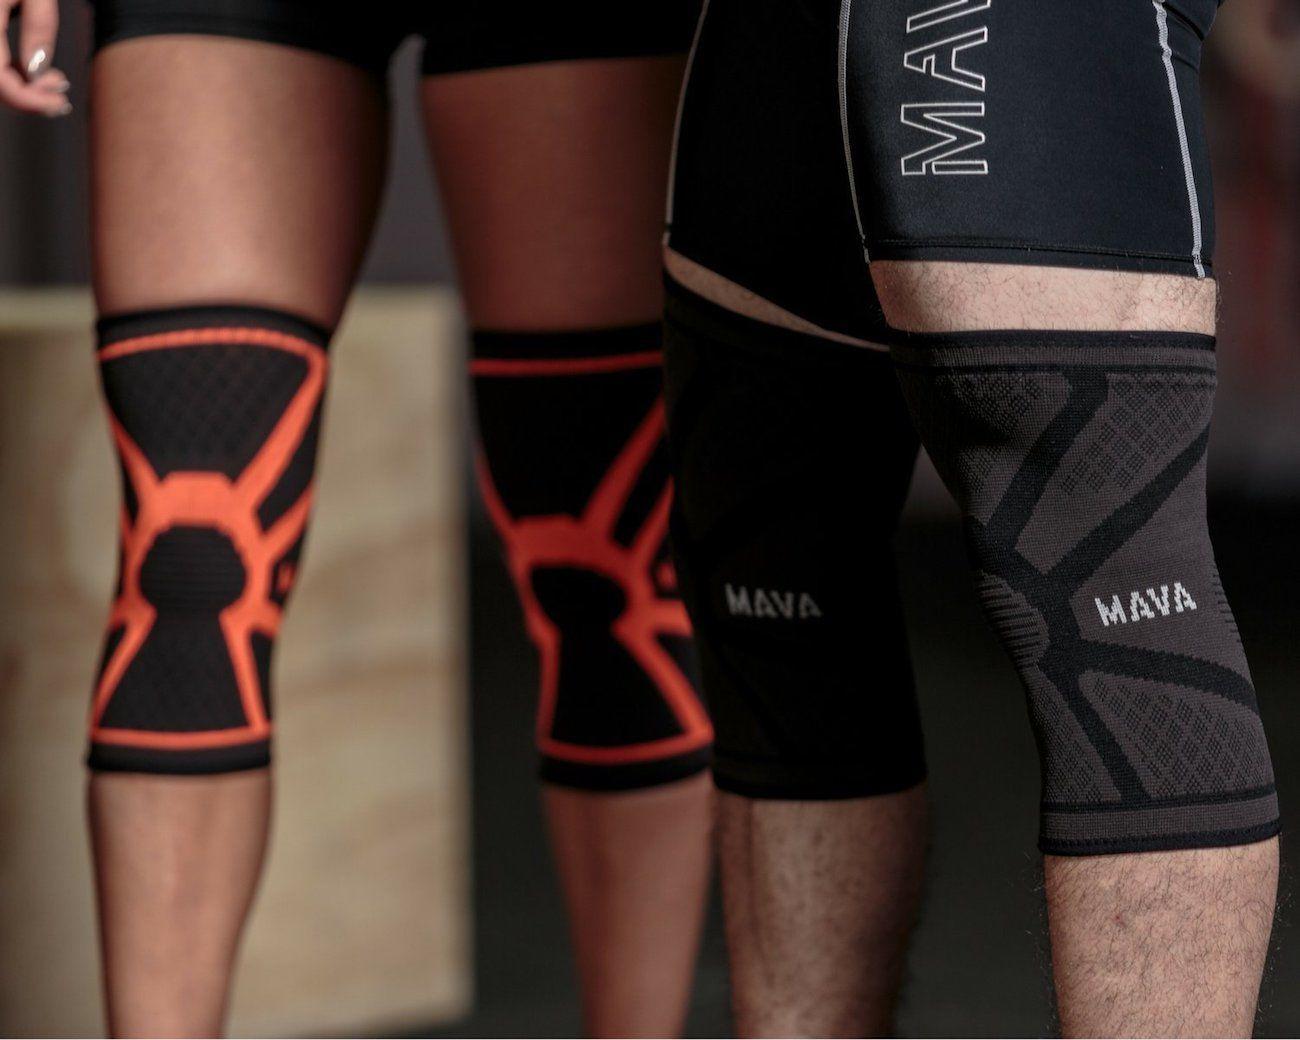 Mava+Sports+Knee+Compression+Sleeve